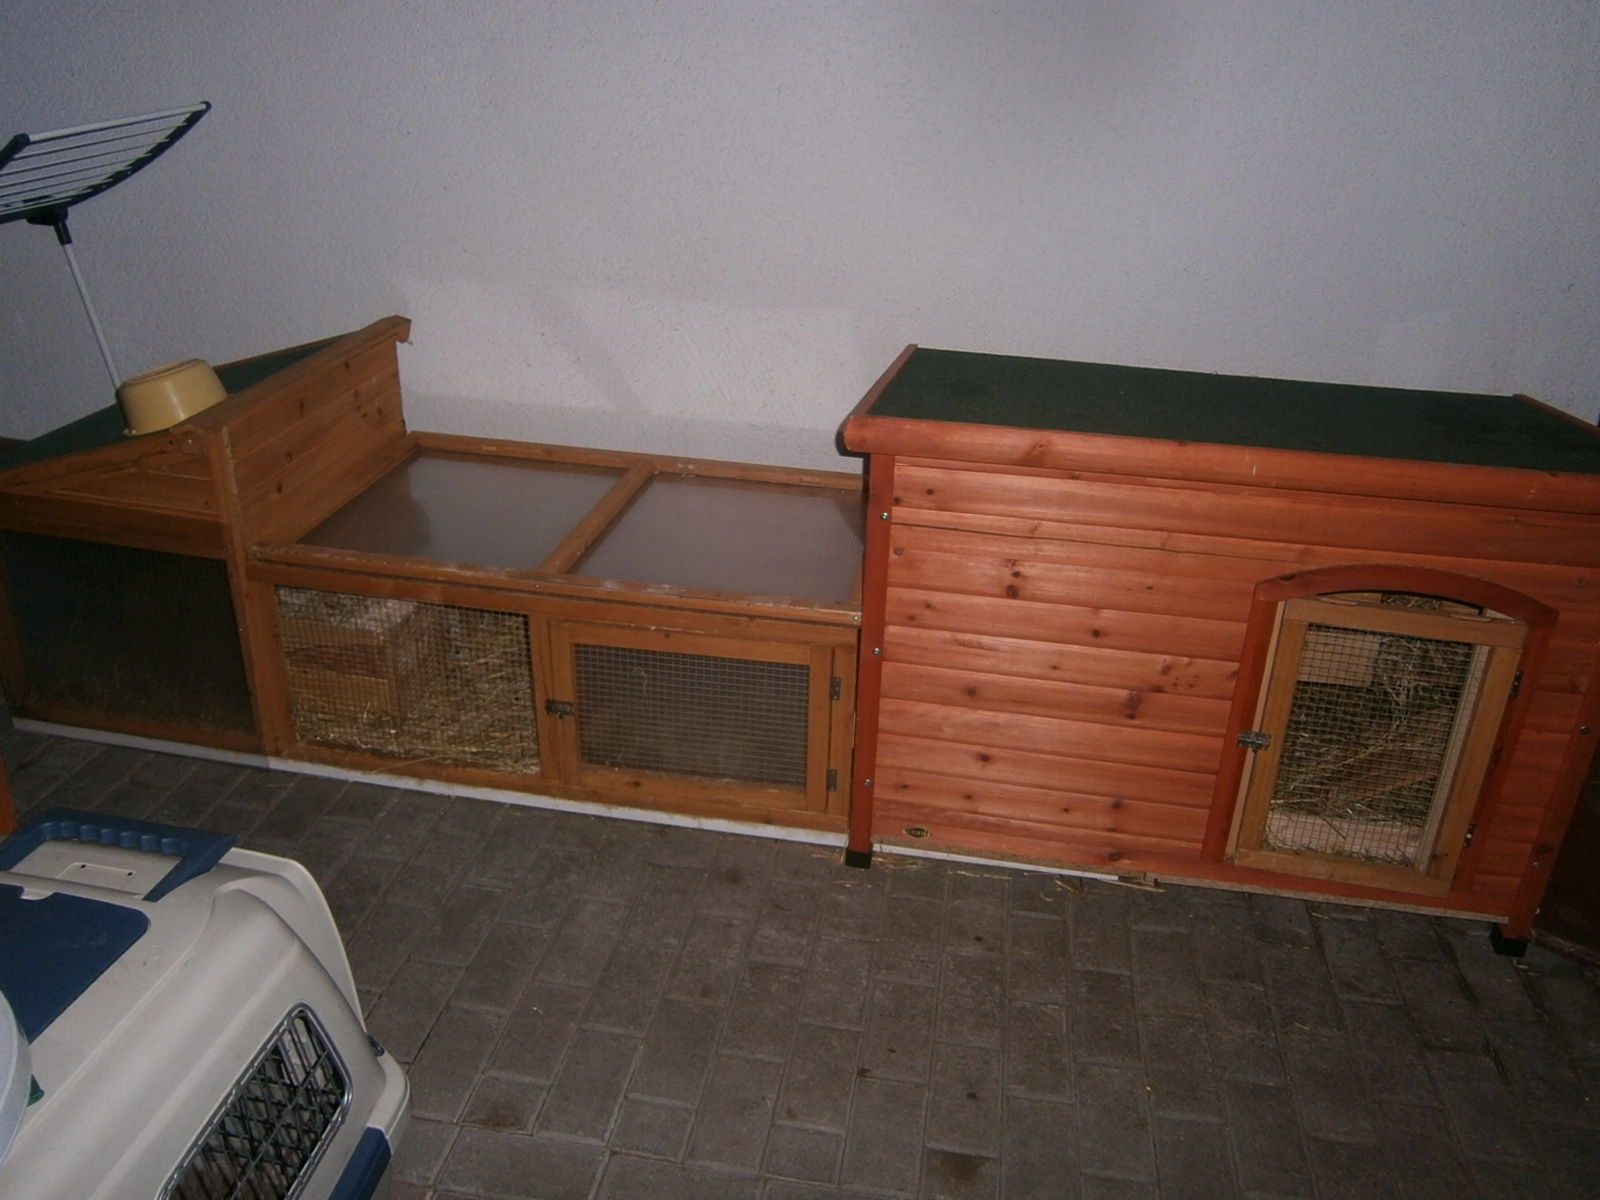 genial meerschweinchen spielzeug selber bauen tierspielzeug. Black Bedroom Furniture Sets. Home Design Ideas